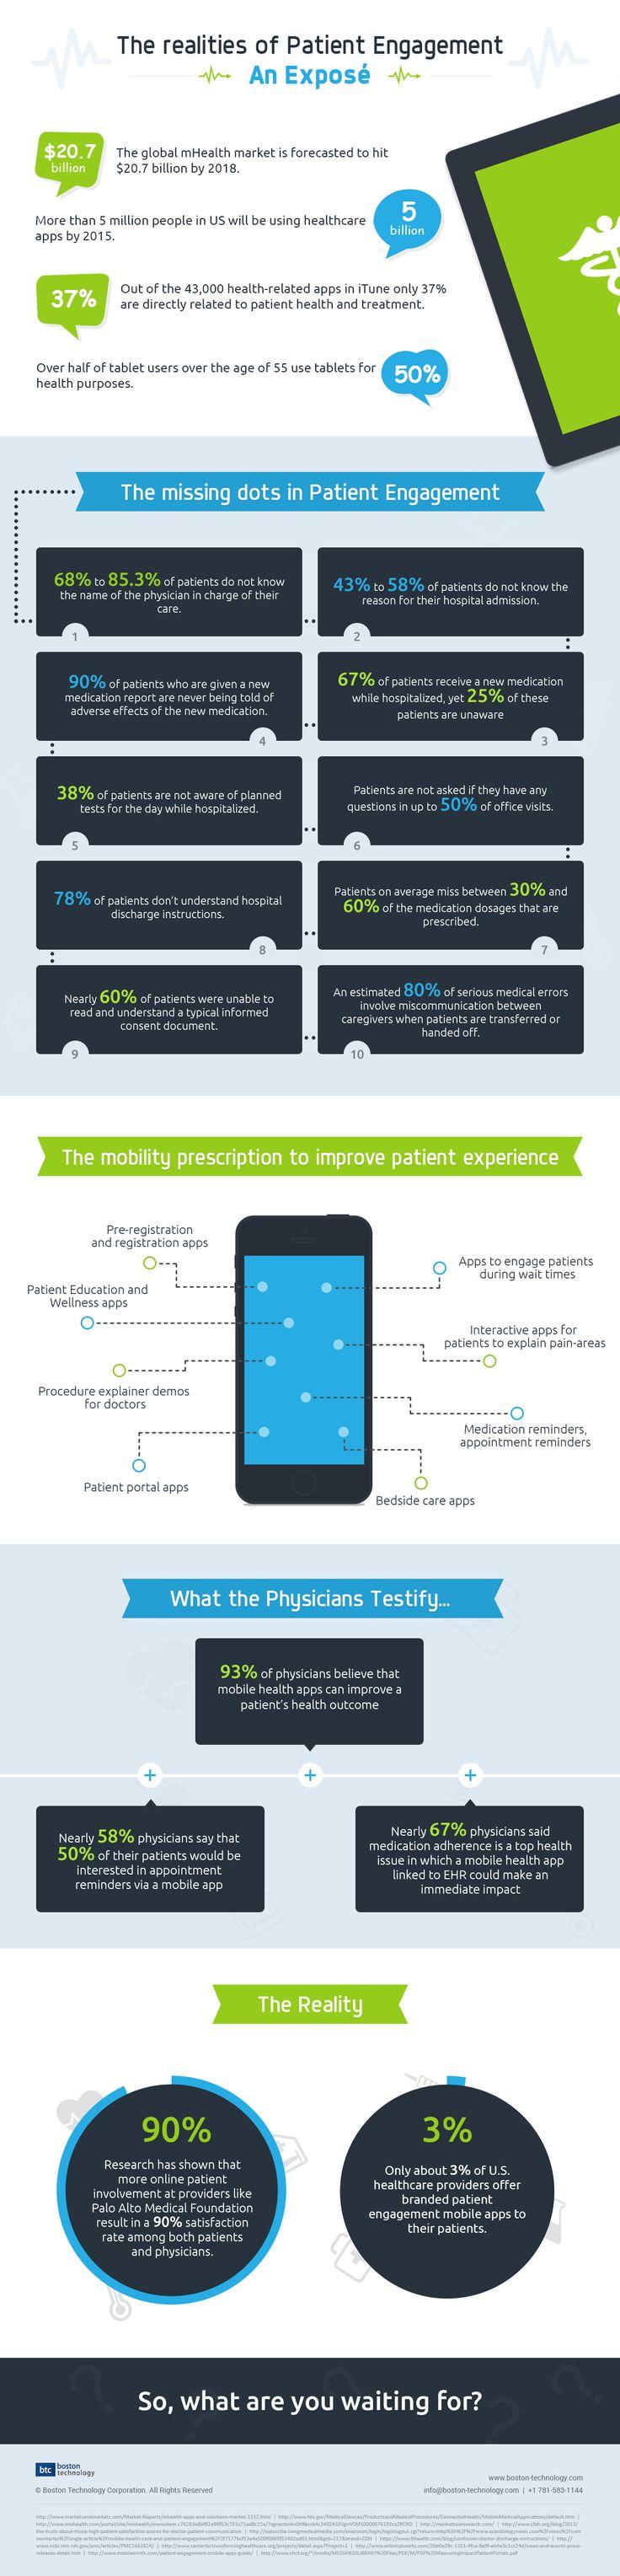 The realities of patient engagement #infographics #patient #hcmktg